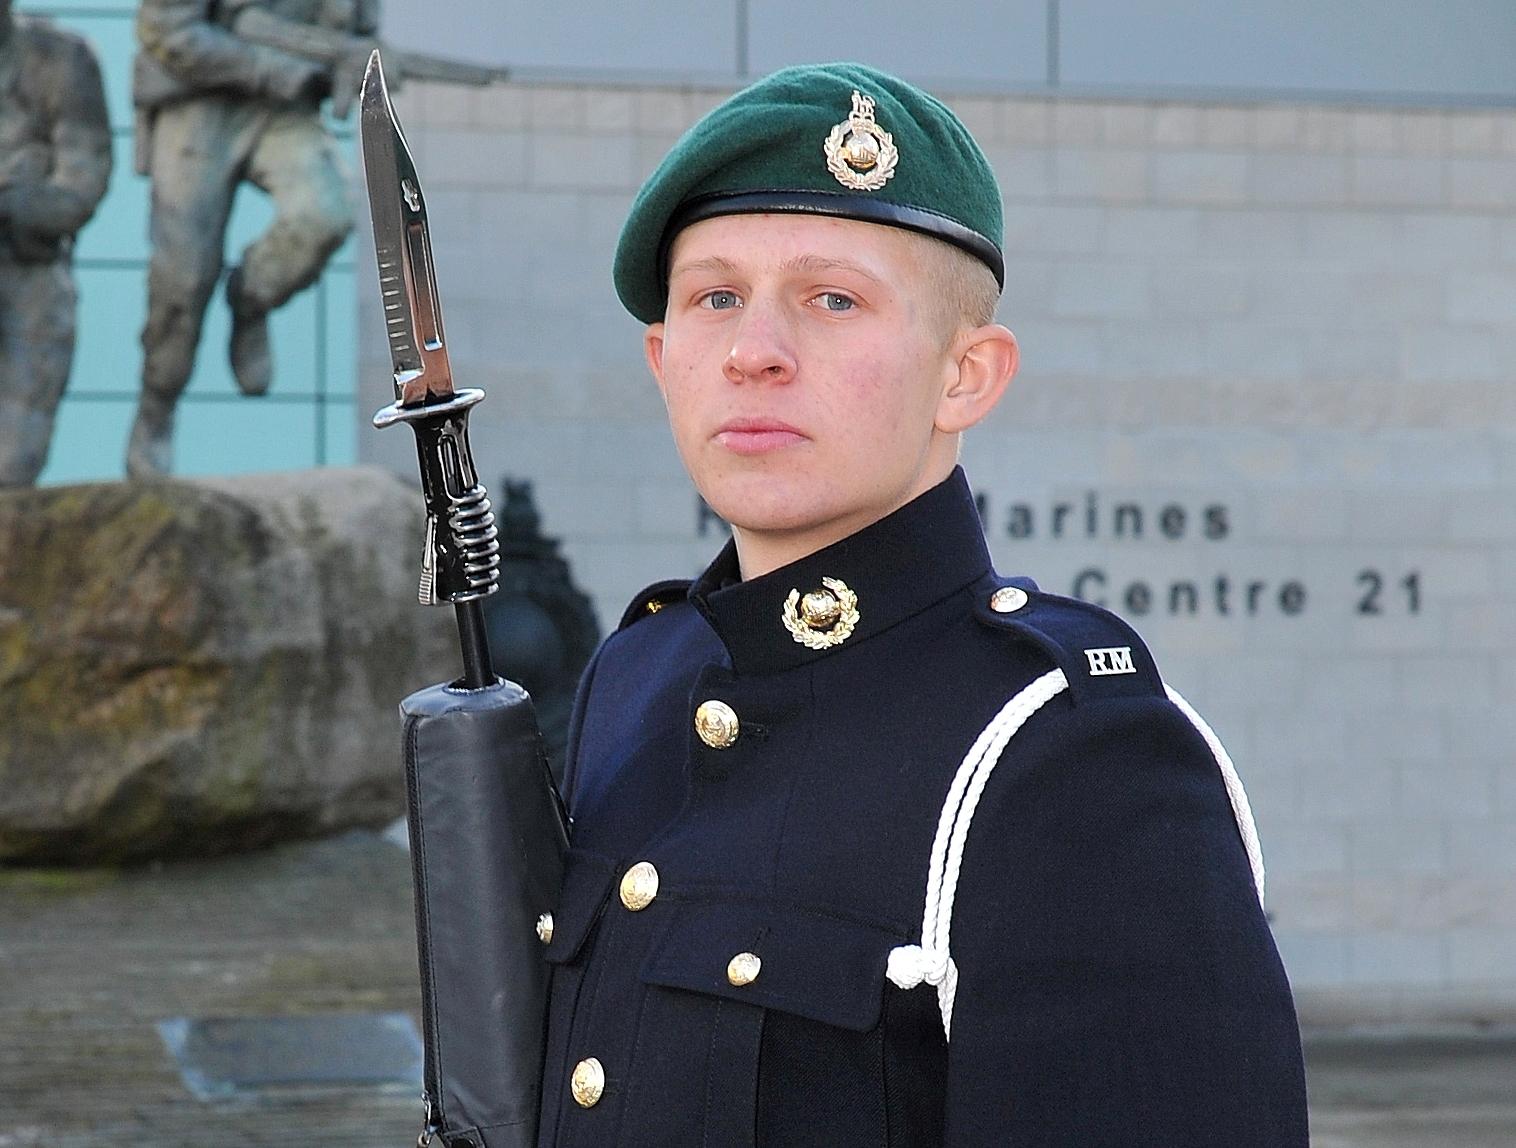 Marine Andrew Dawes